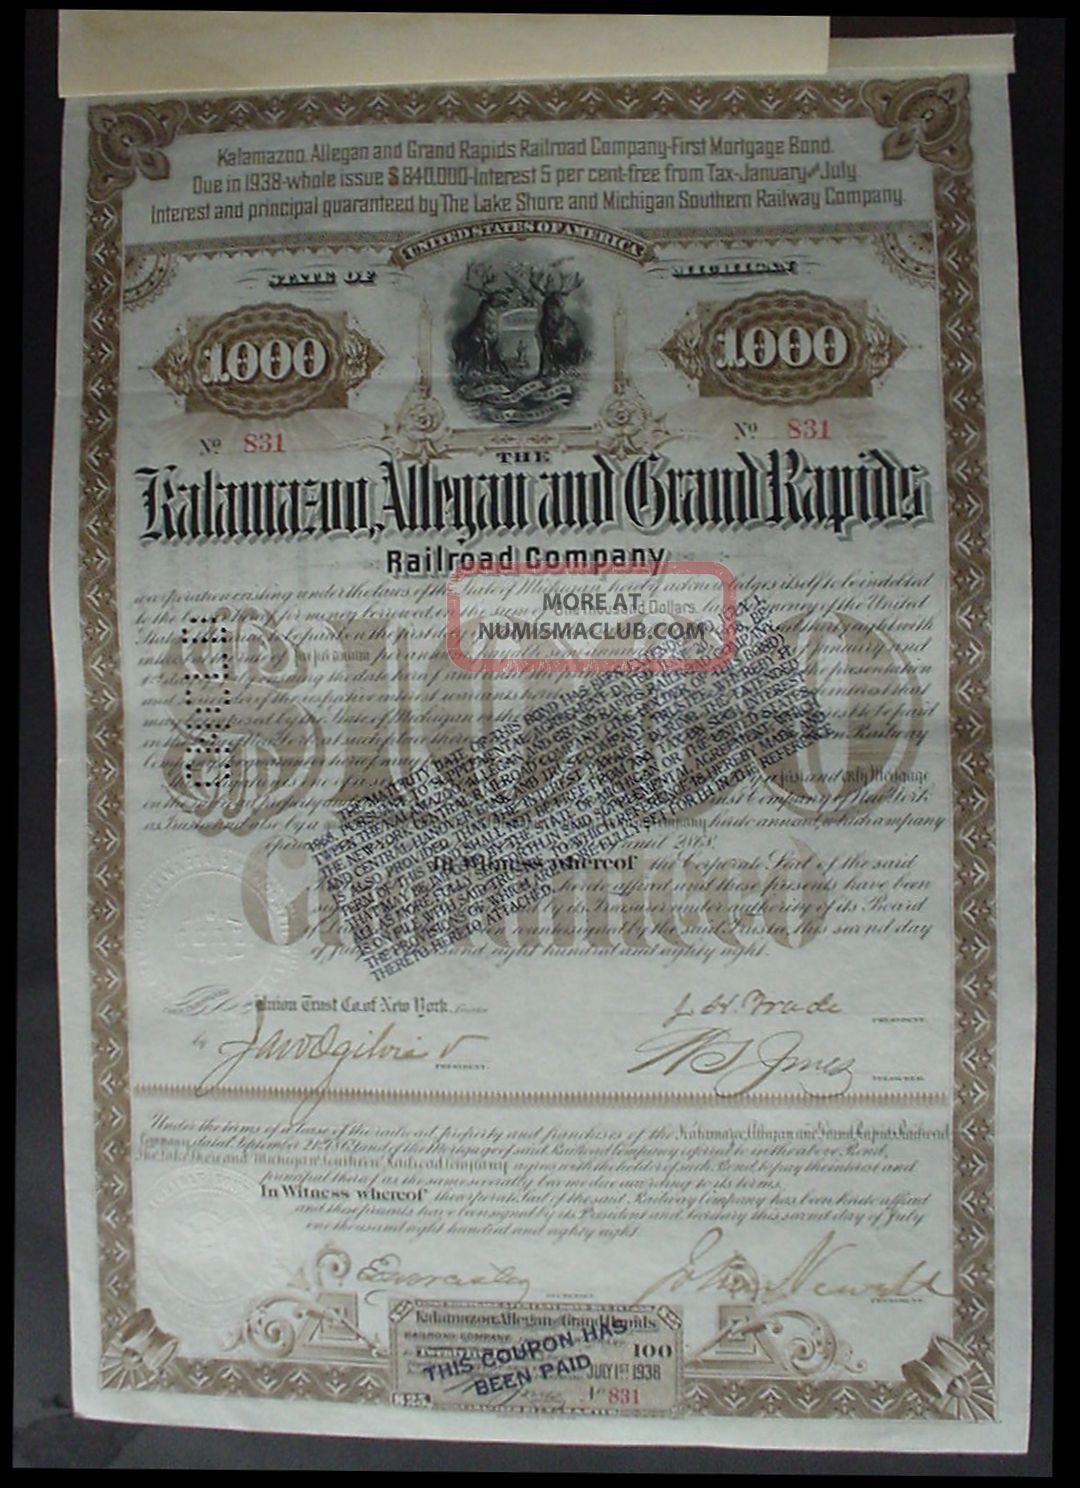 The Kalamazoo Allegan And Grand Rapids Rr Company 1888 Stocks & Bonds, Scripophily photo